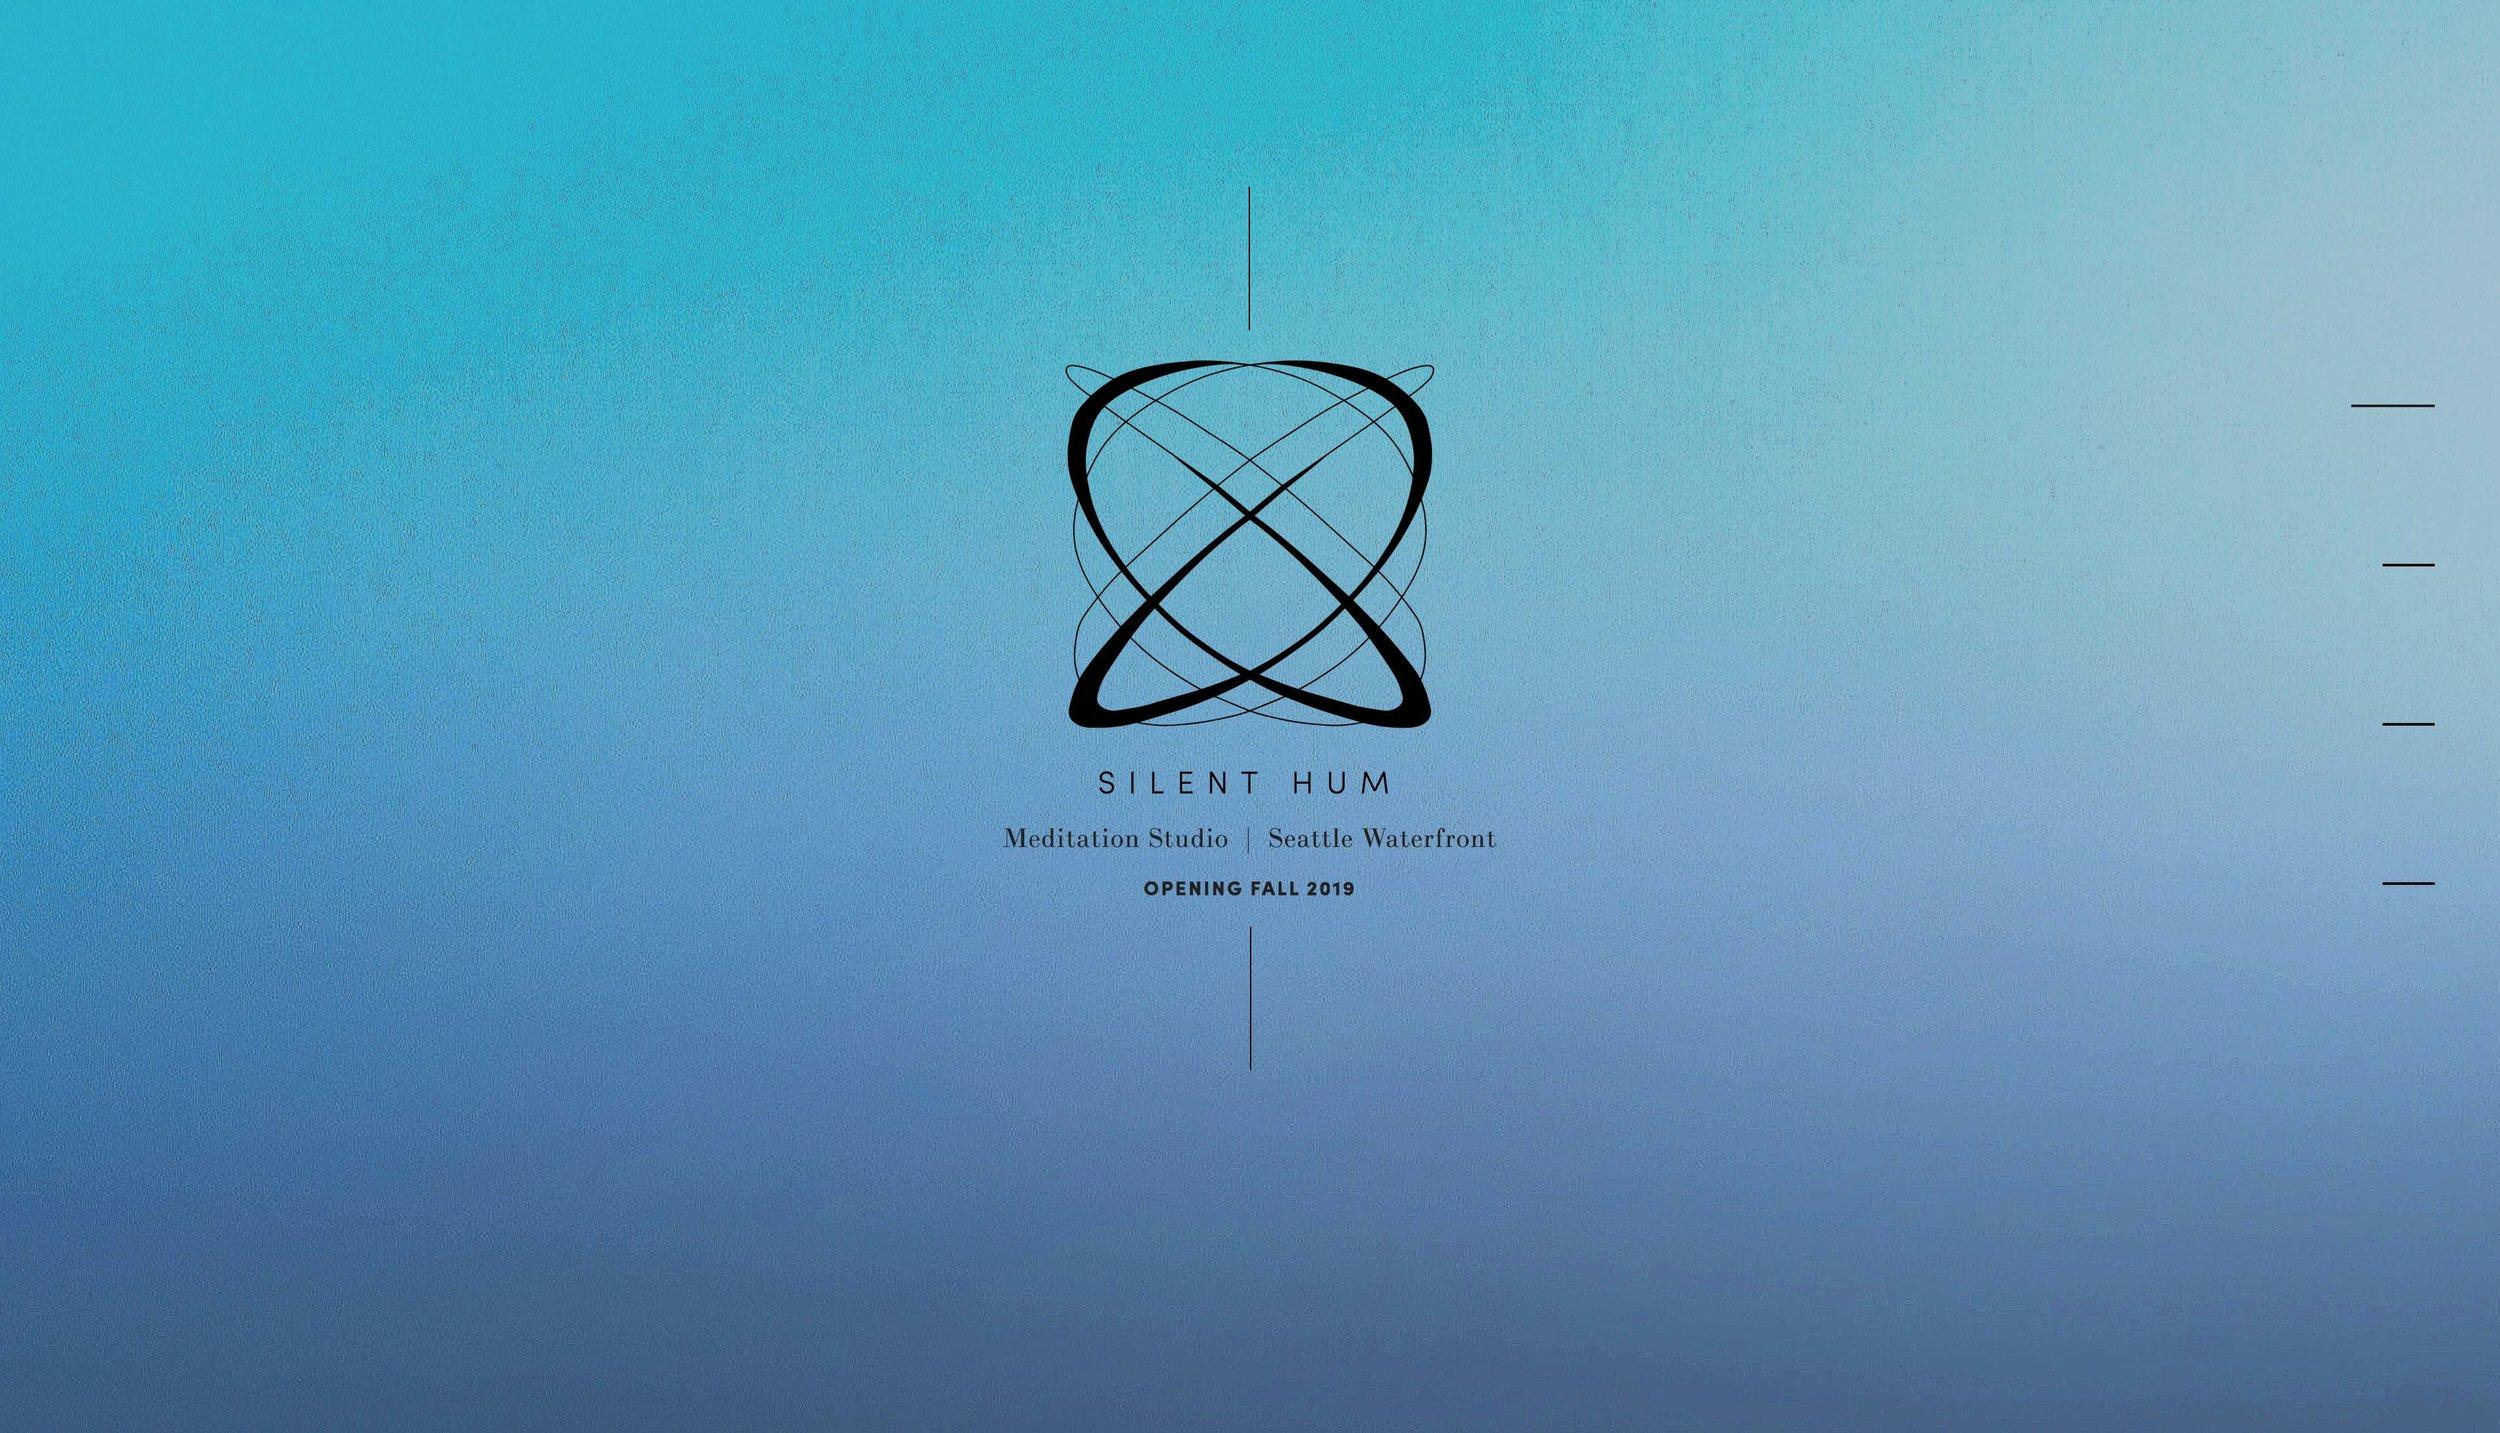 Silent Hum | Meditation Studio